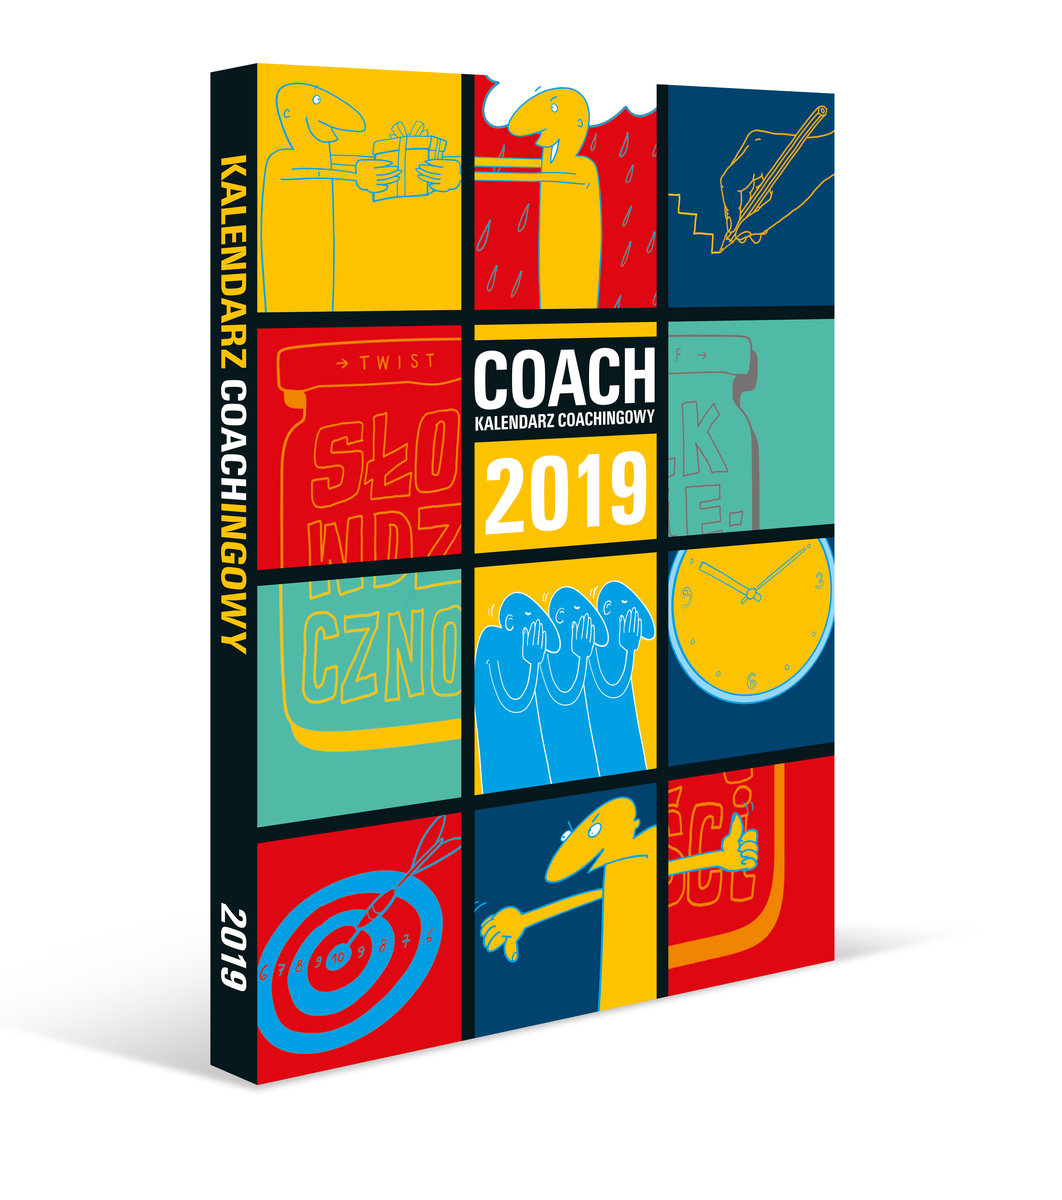 kalendarz coachingowy